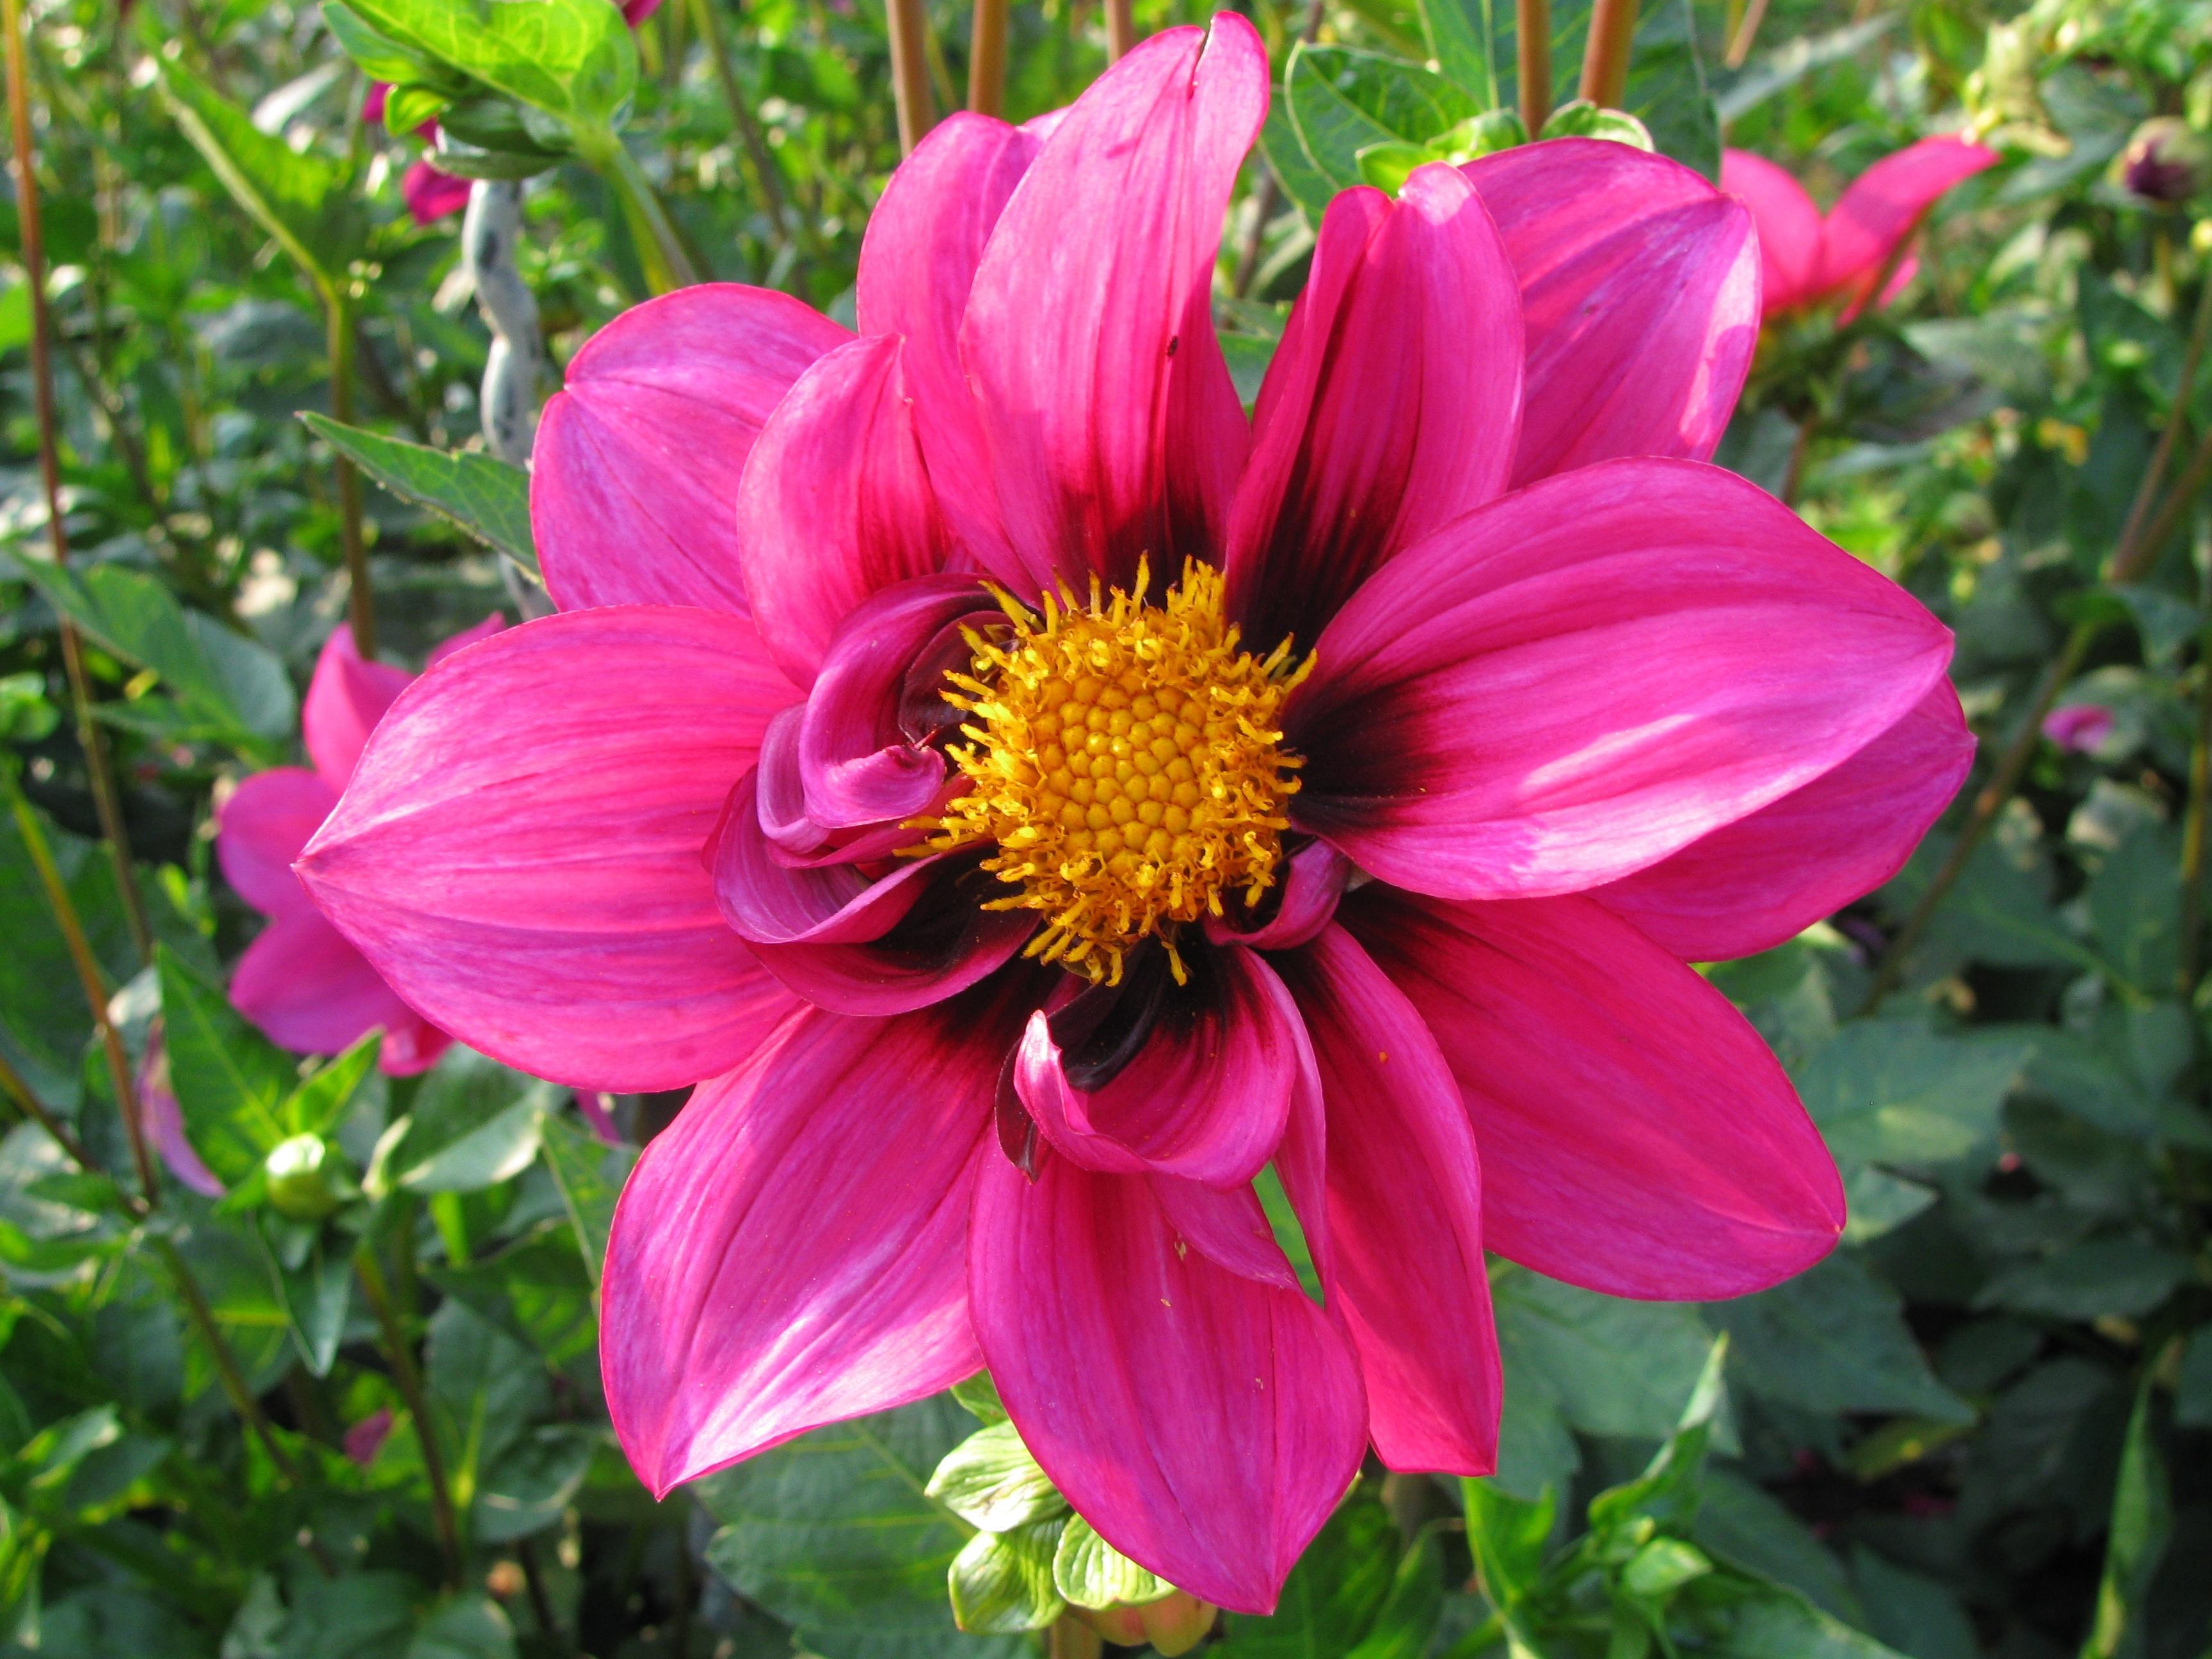 Fotograf Cicek Tacyapragi Renk Botanik Pembe Bitki Ortusu